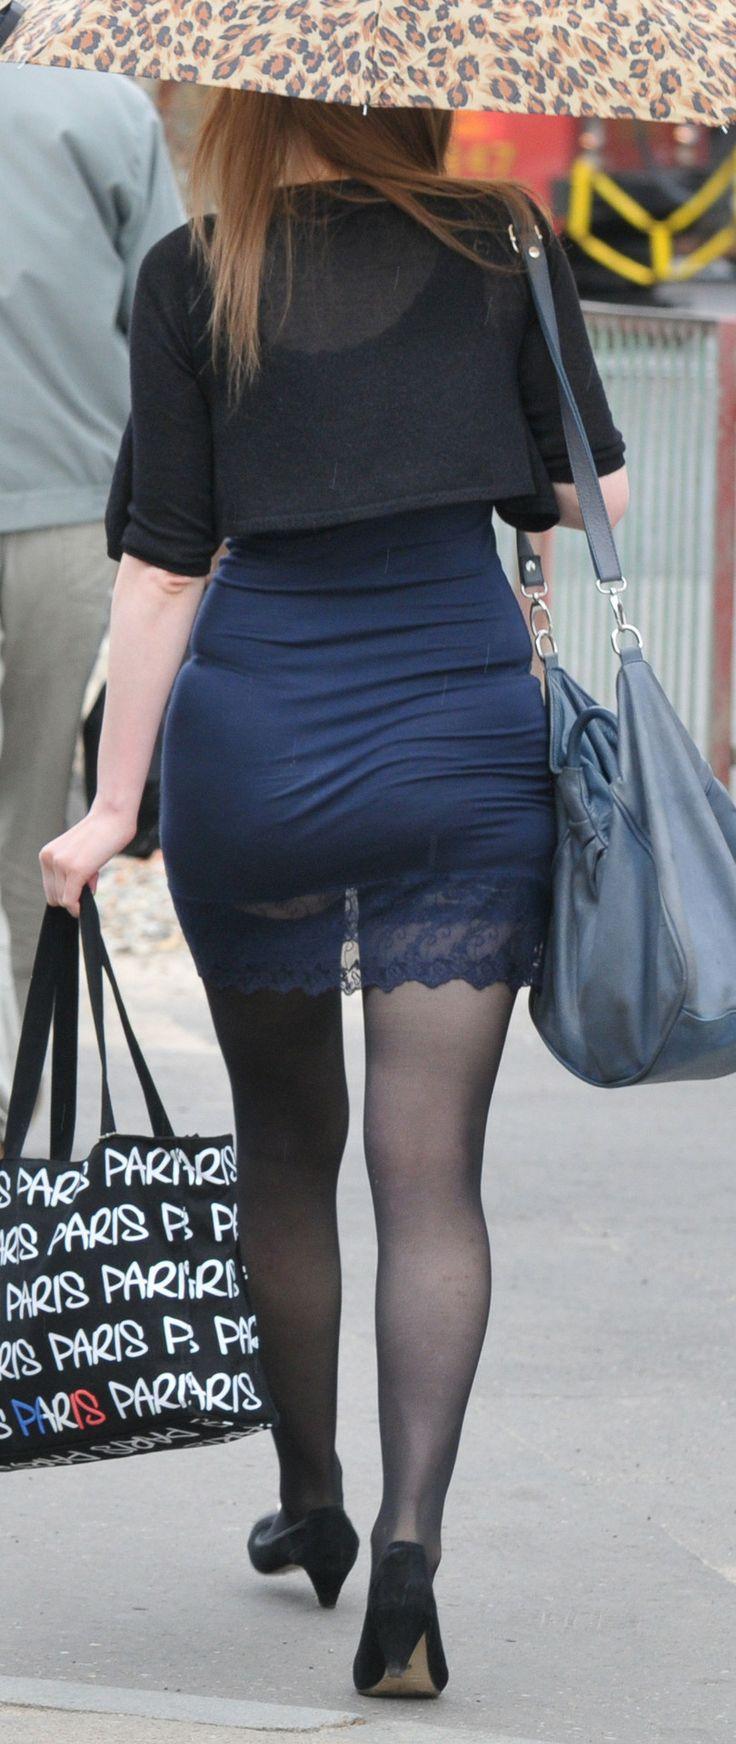 tight dress panty line